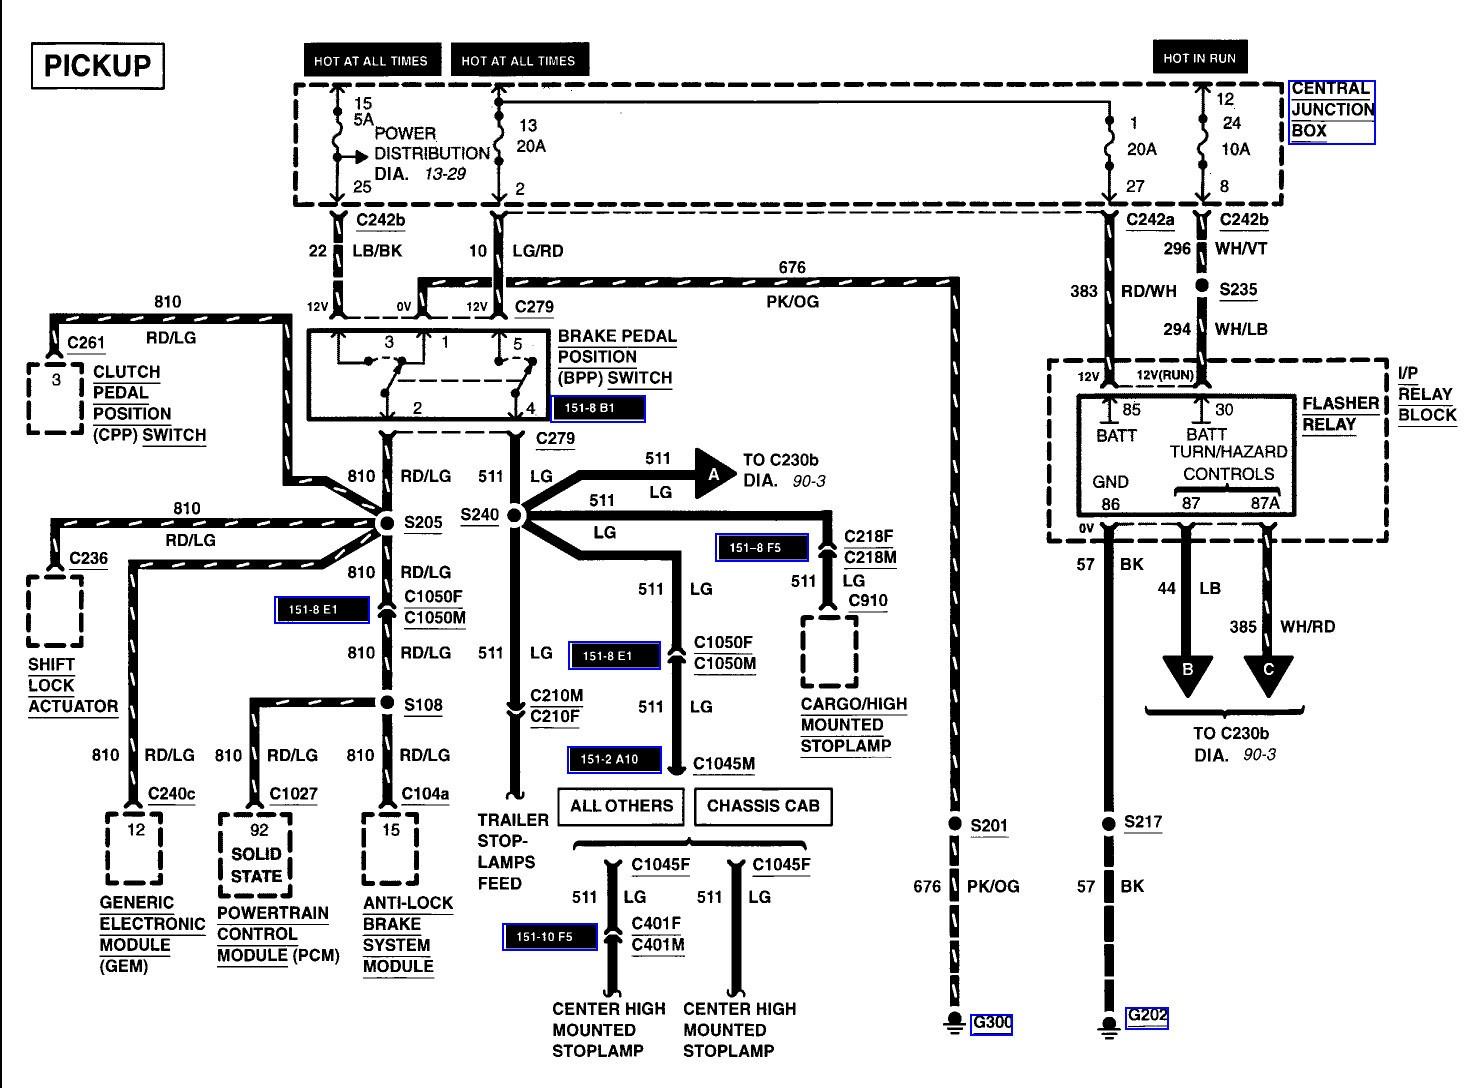 2005 F350 Ac Diagram - Get Wiring Diagram F Wiring Diagram Air Cond on